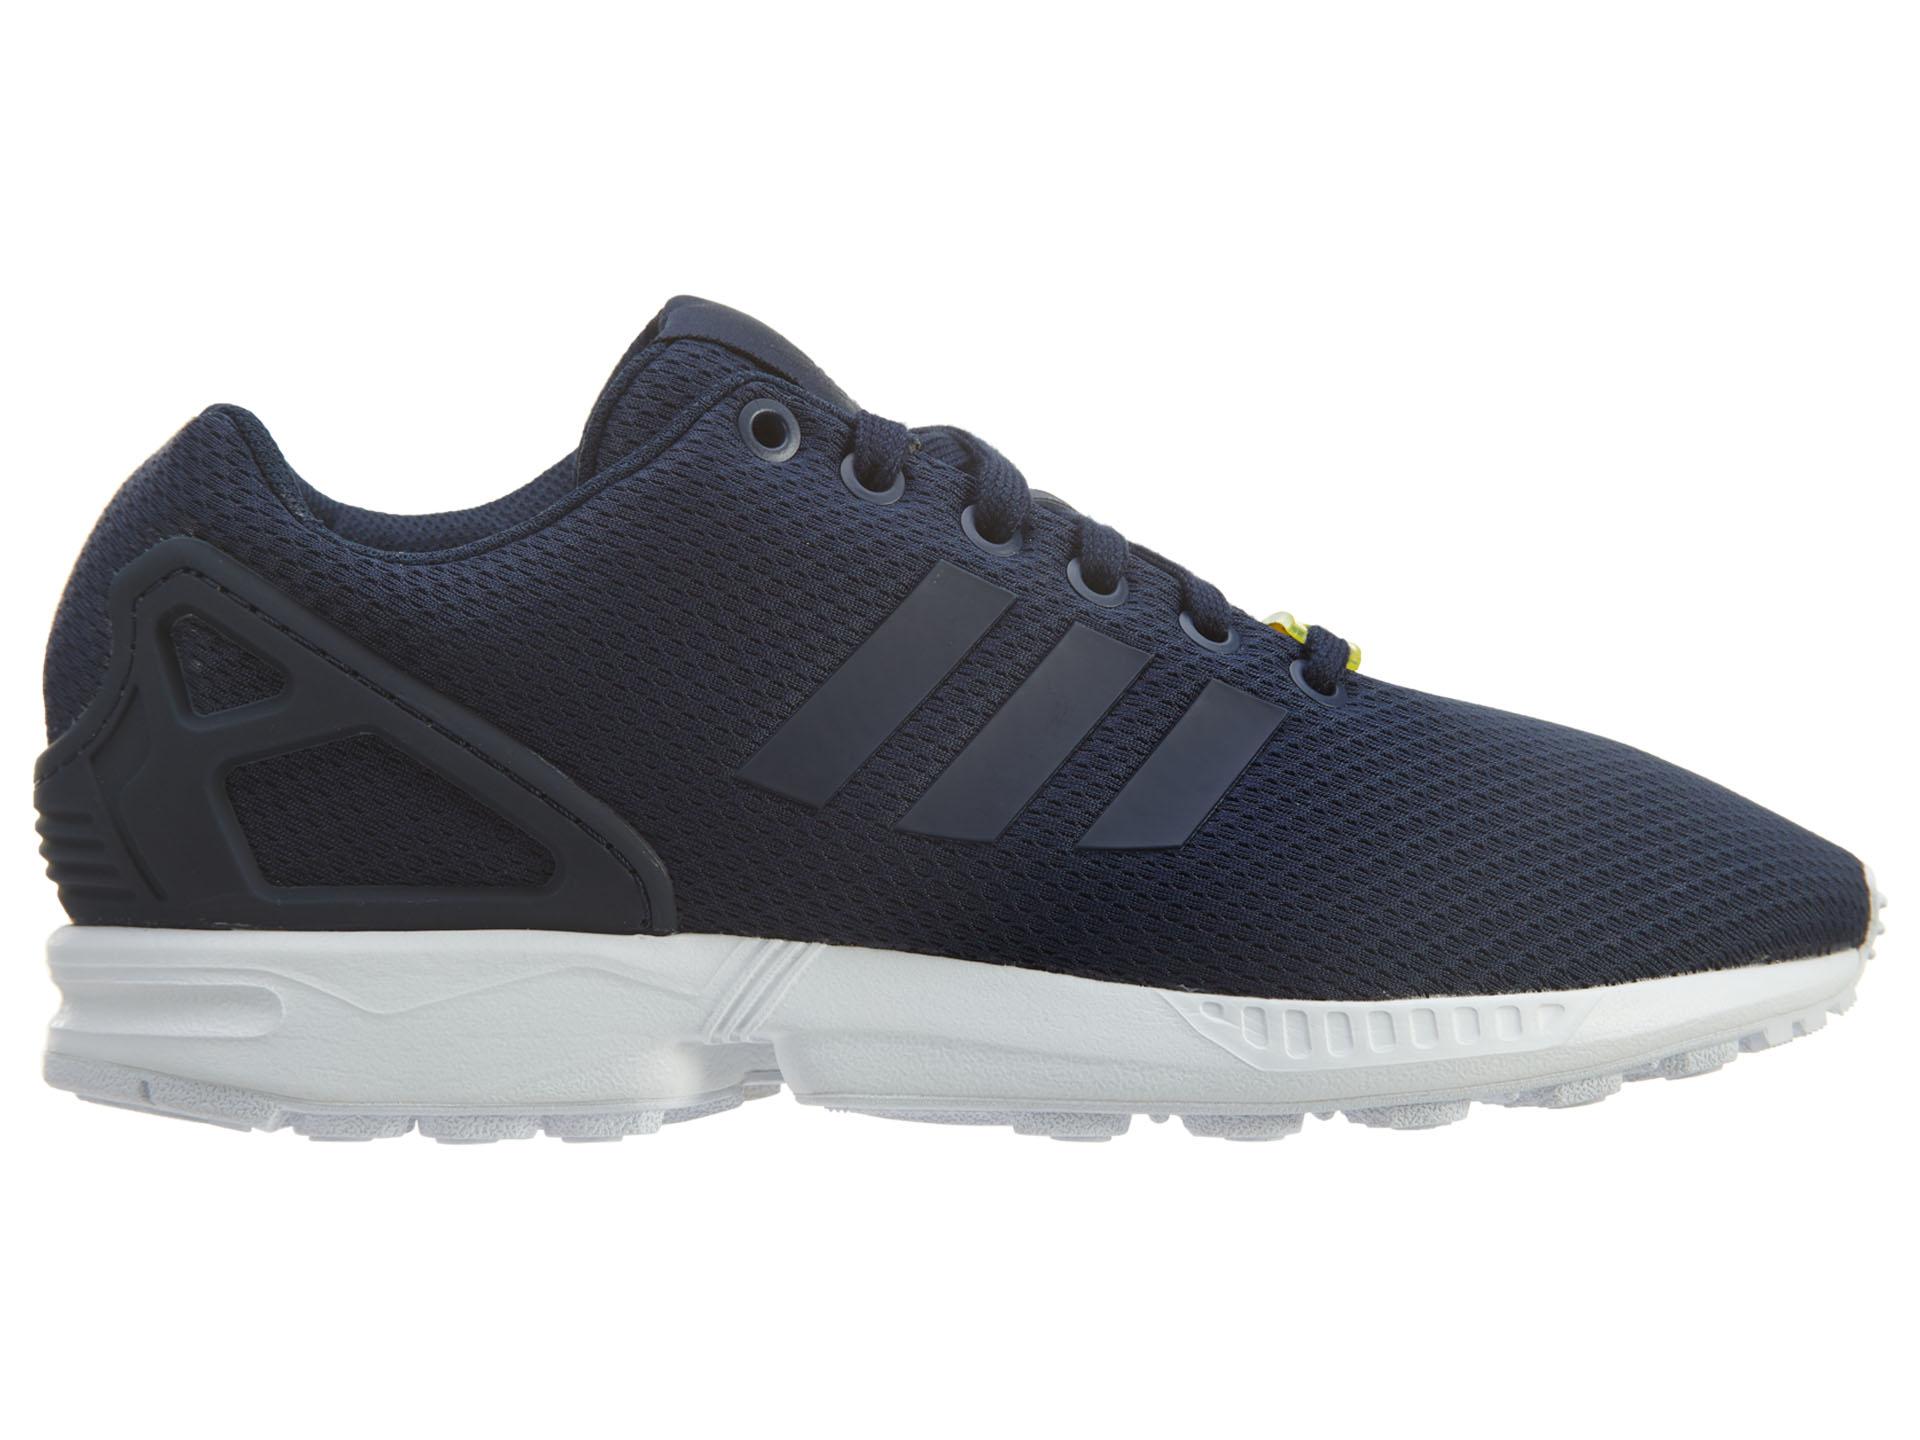 quality design 9e8a7 9730f ... official adidas zx flux dark blue core white 26862 cd97d